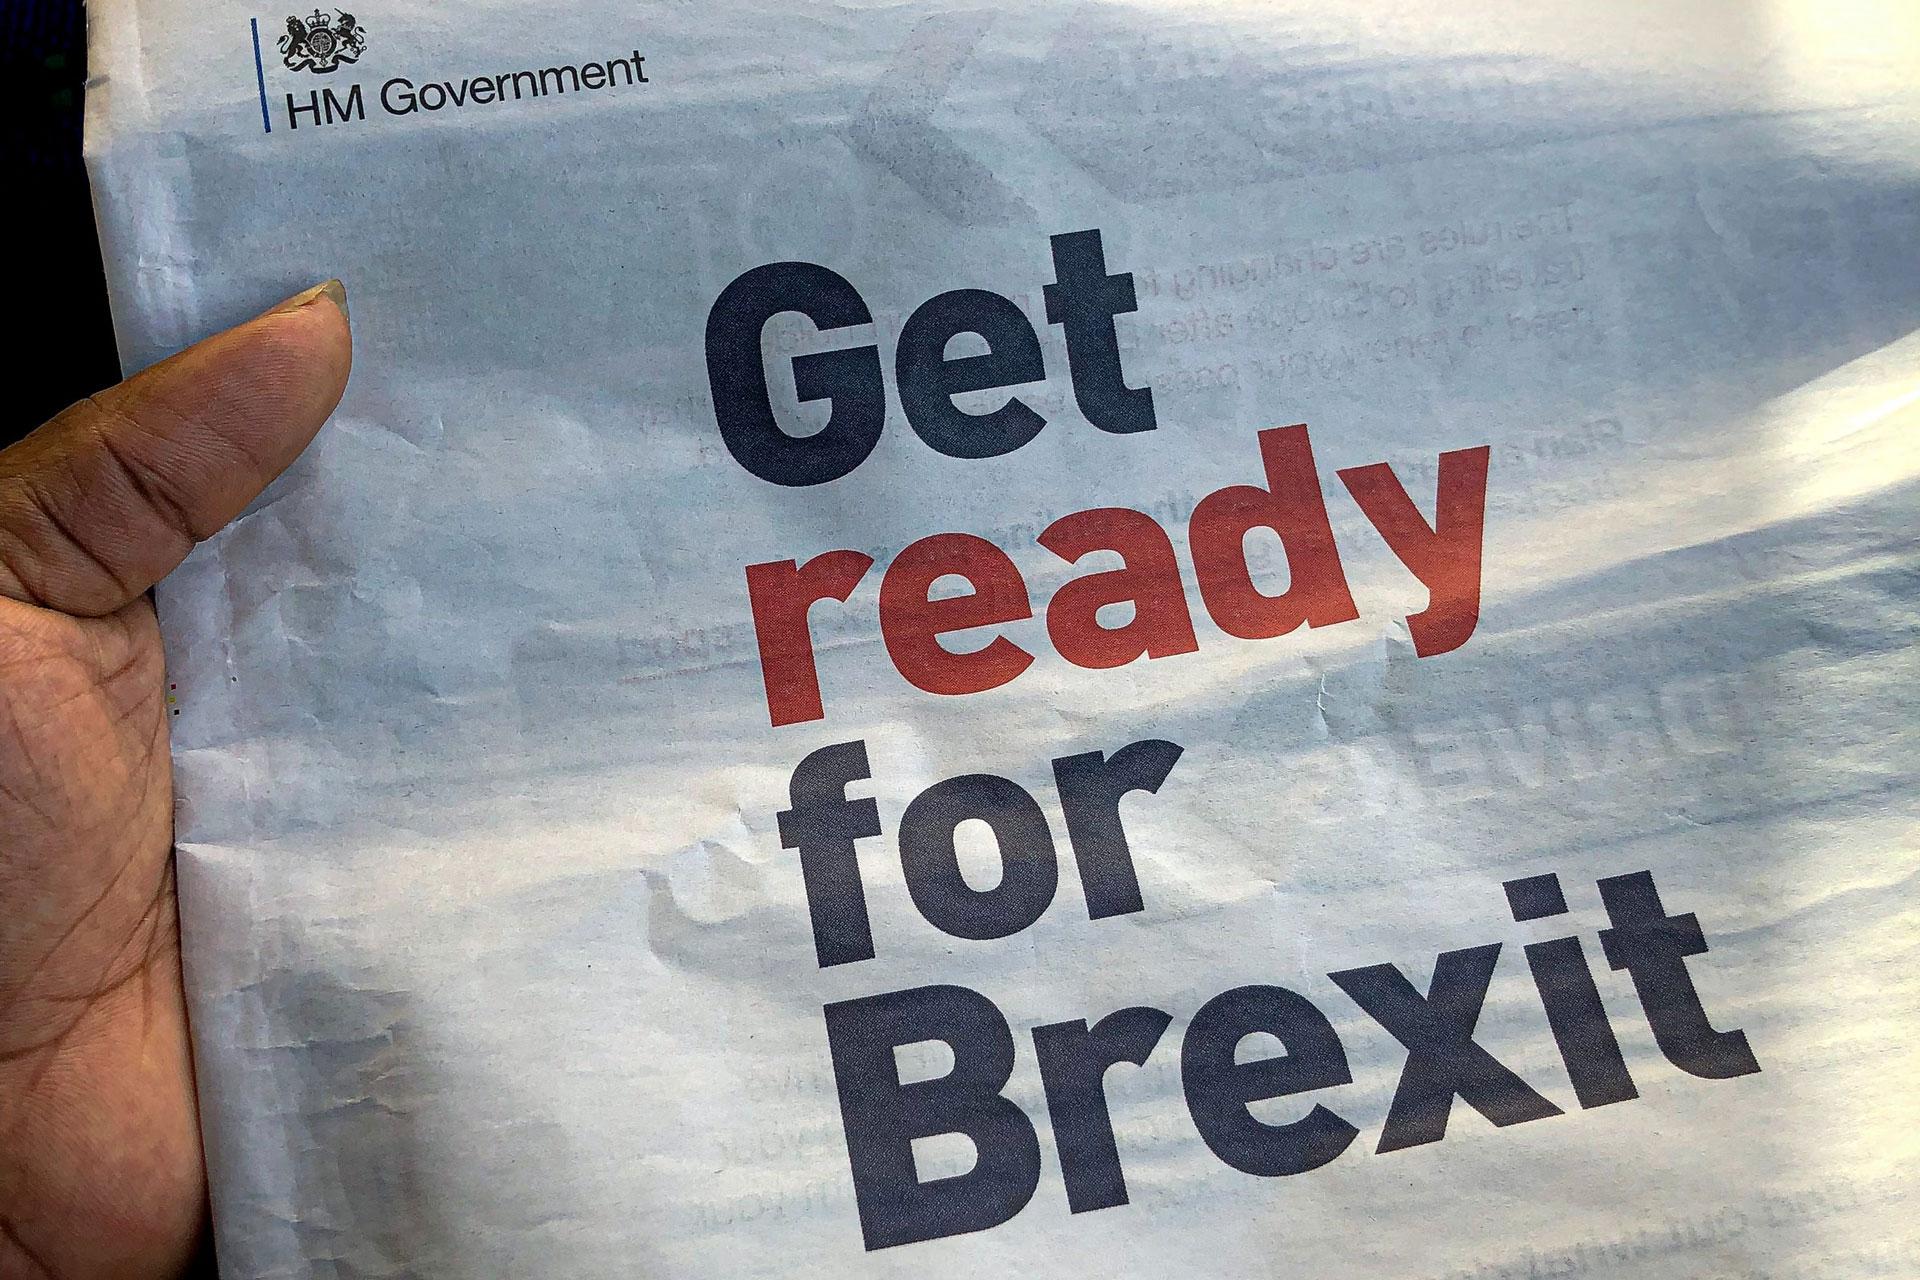 Brexit reminders